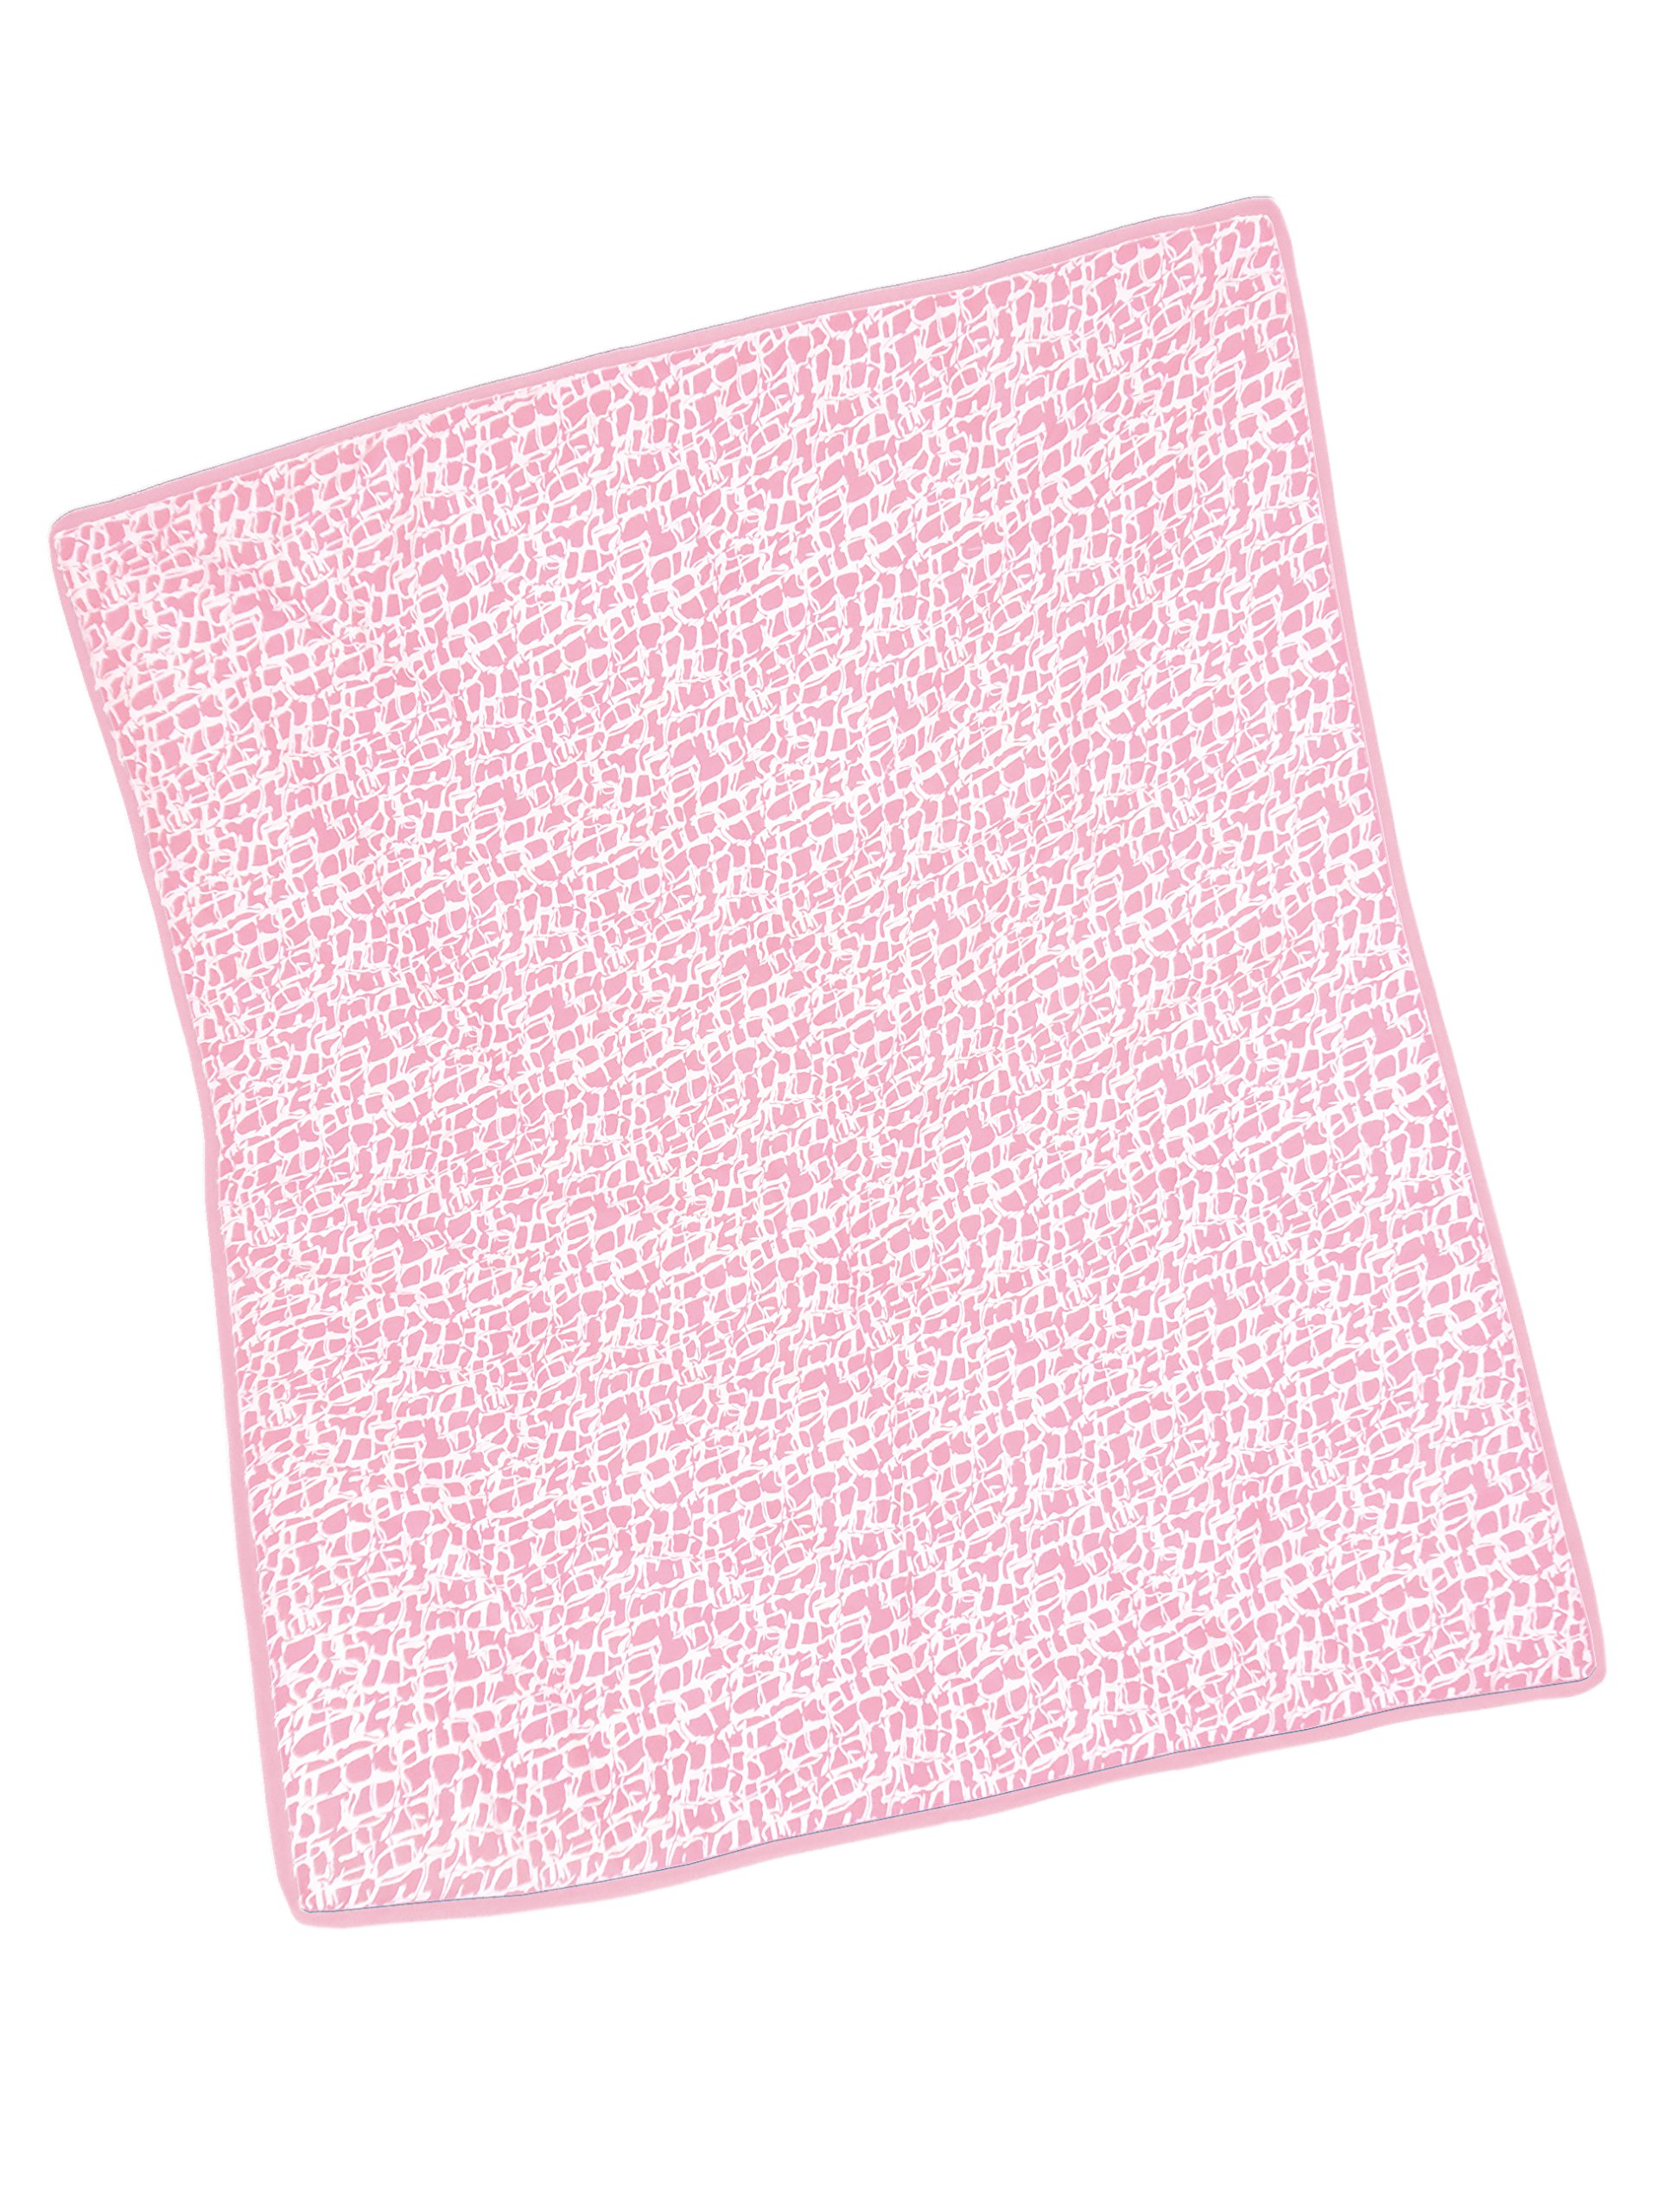 Baby Doll Bedding Cobblestone Crib Comforter, Pink